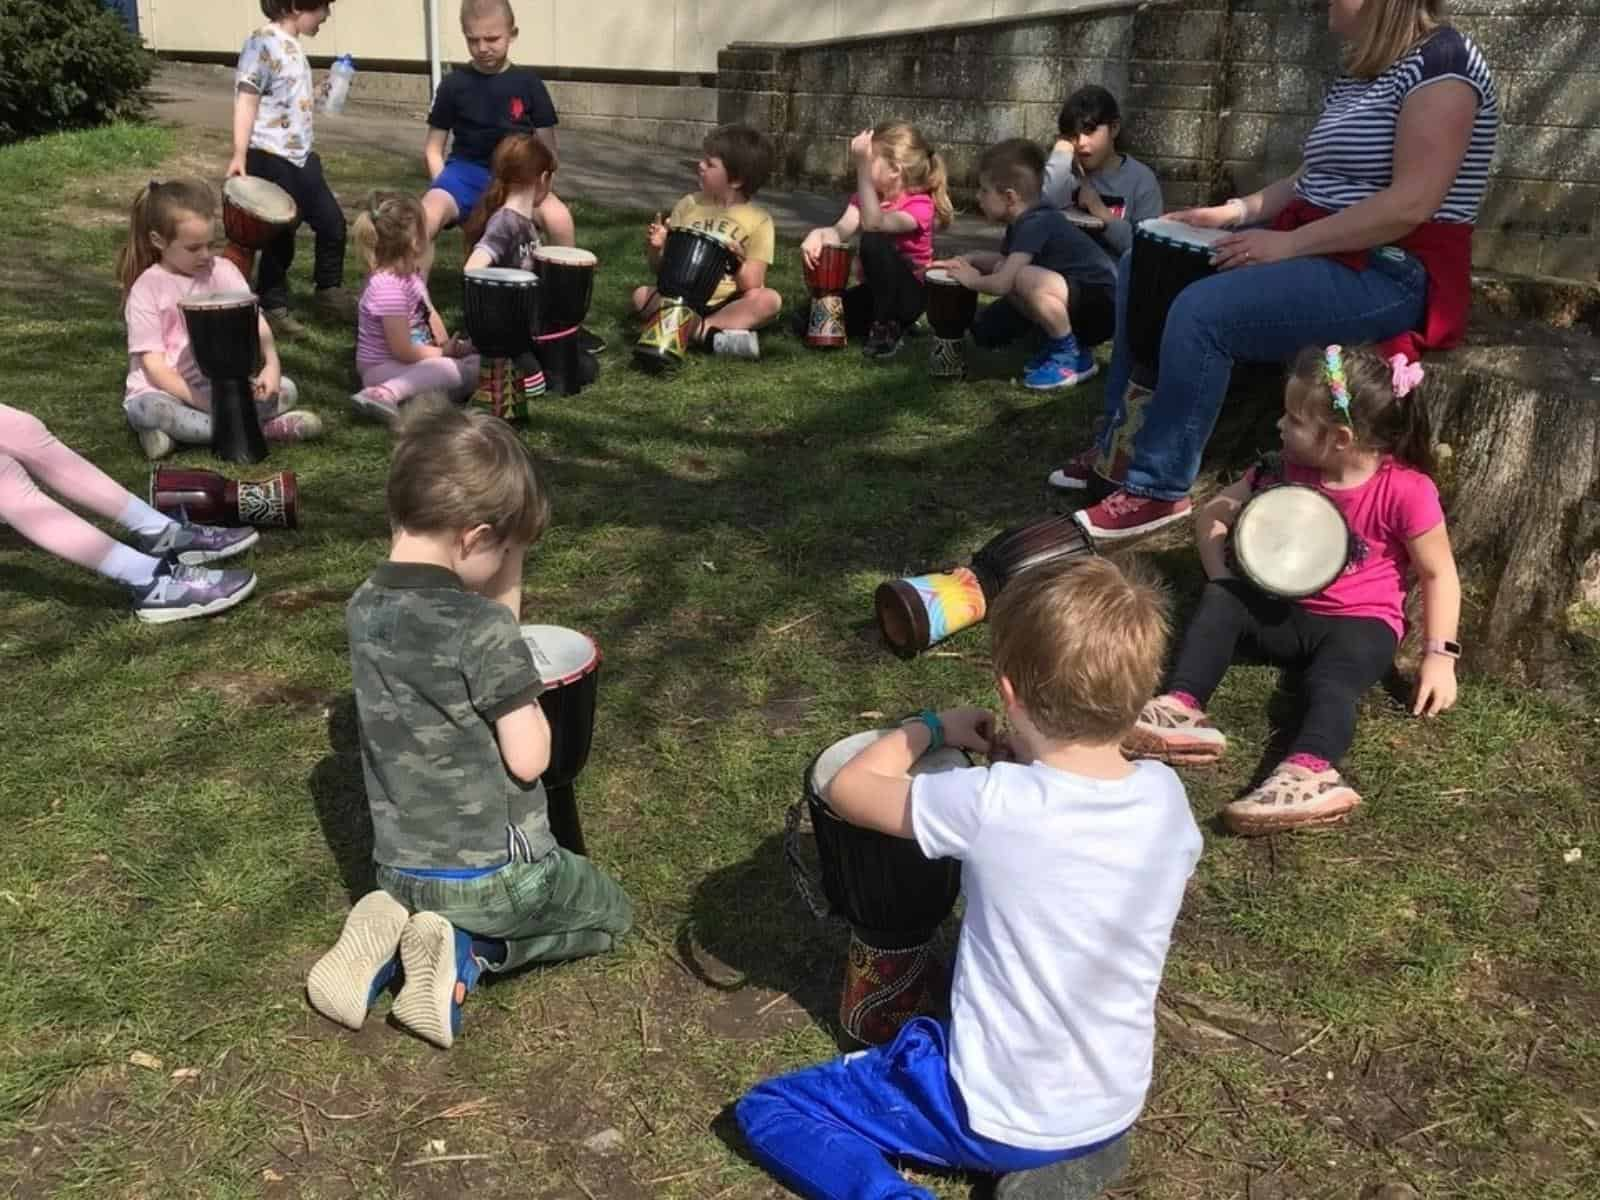 Young children enjoying outdoor activities at the summer camp